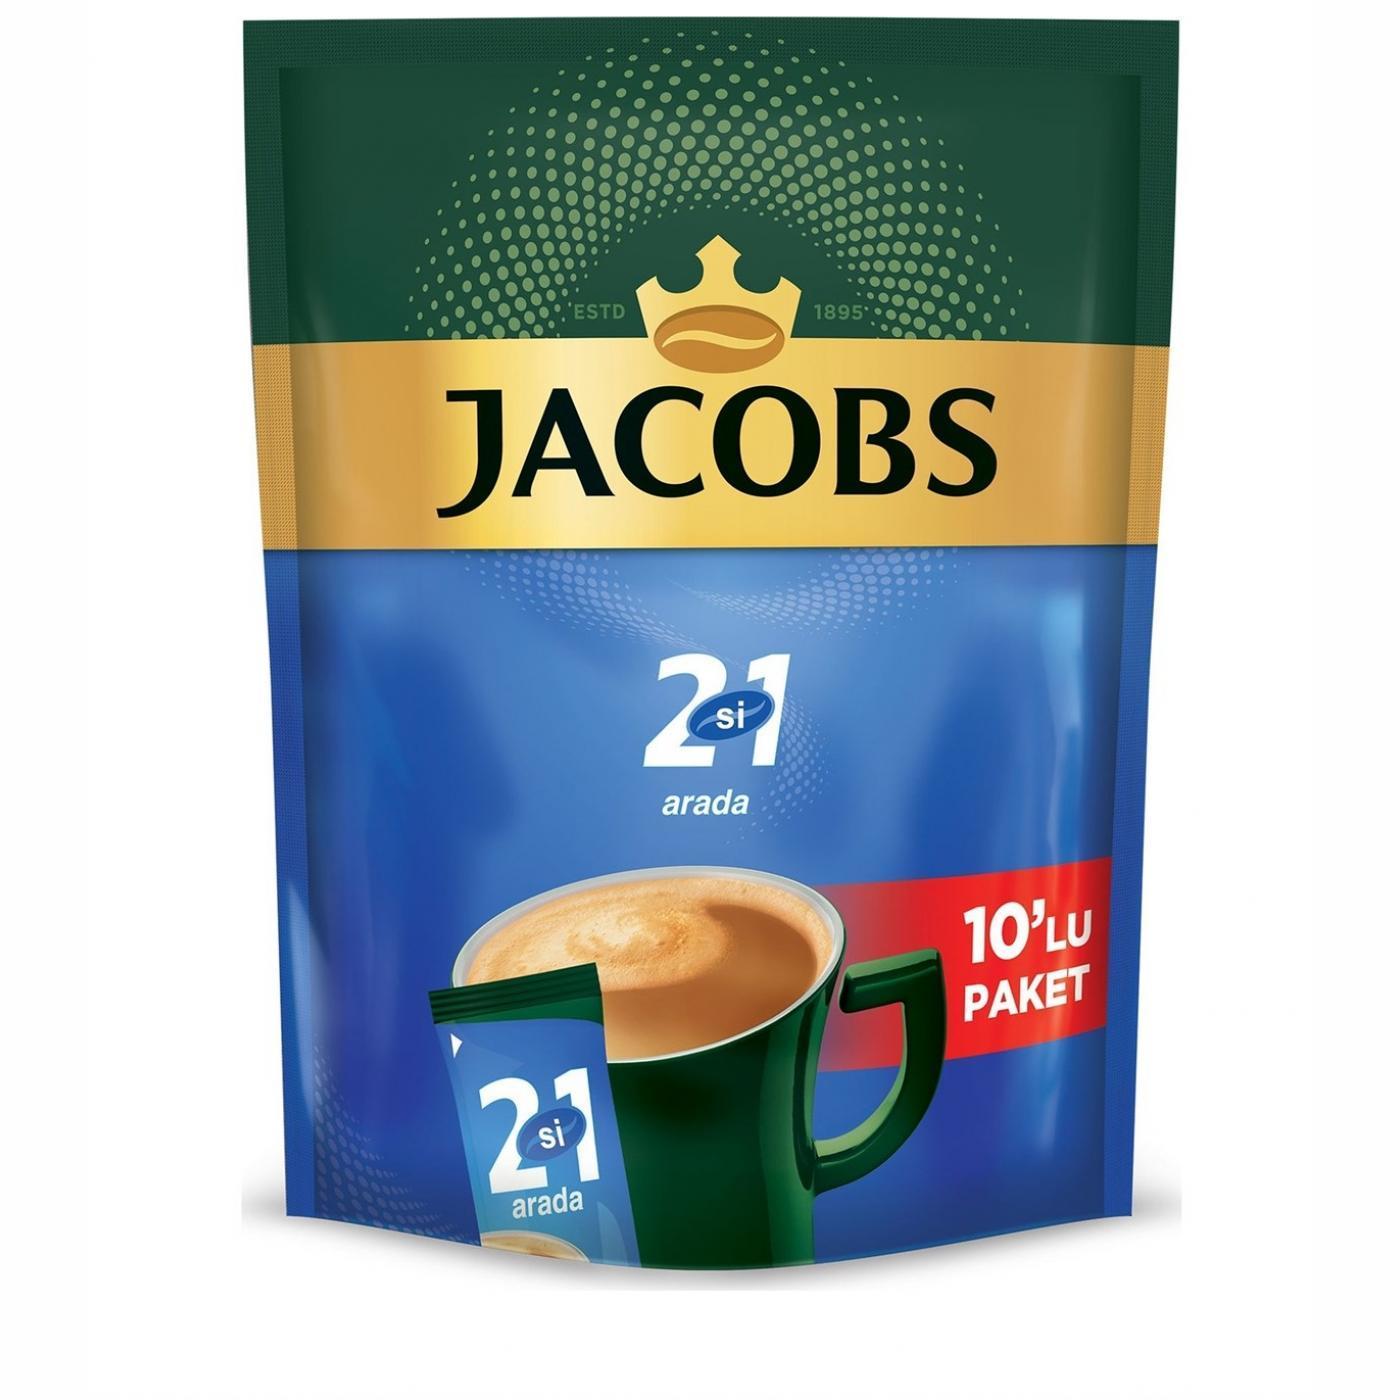 JACOBS 2 İN 1 ARADA 10LU PAKET